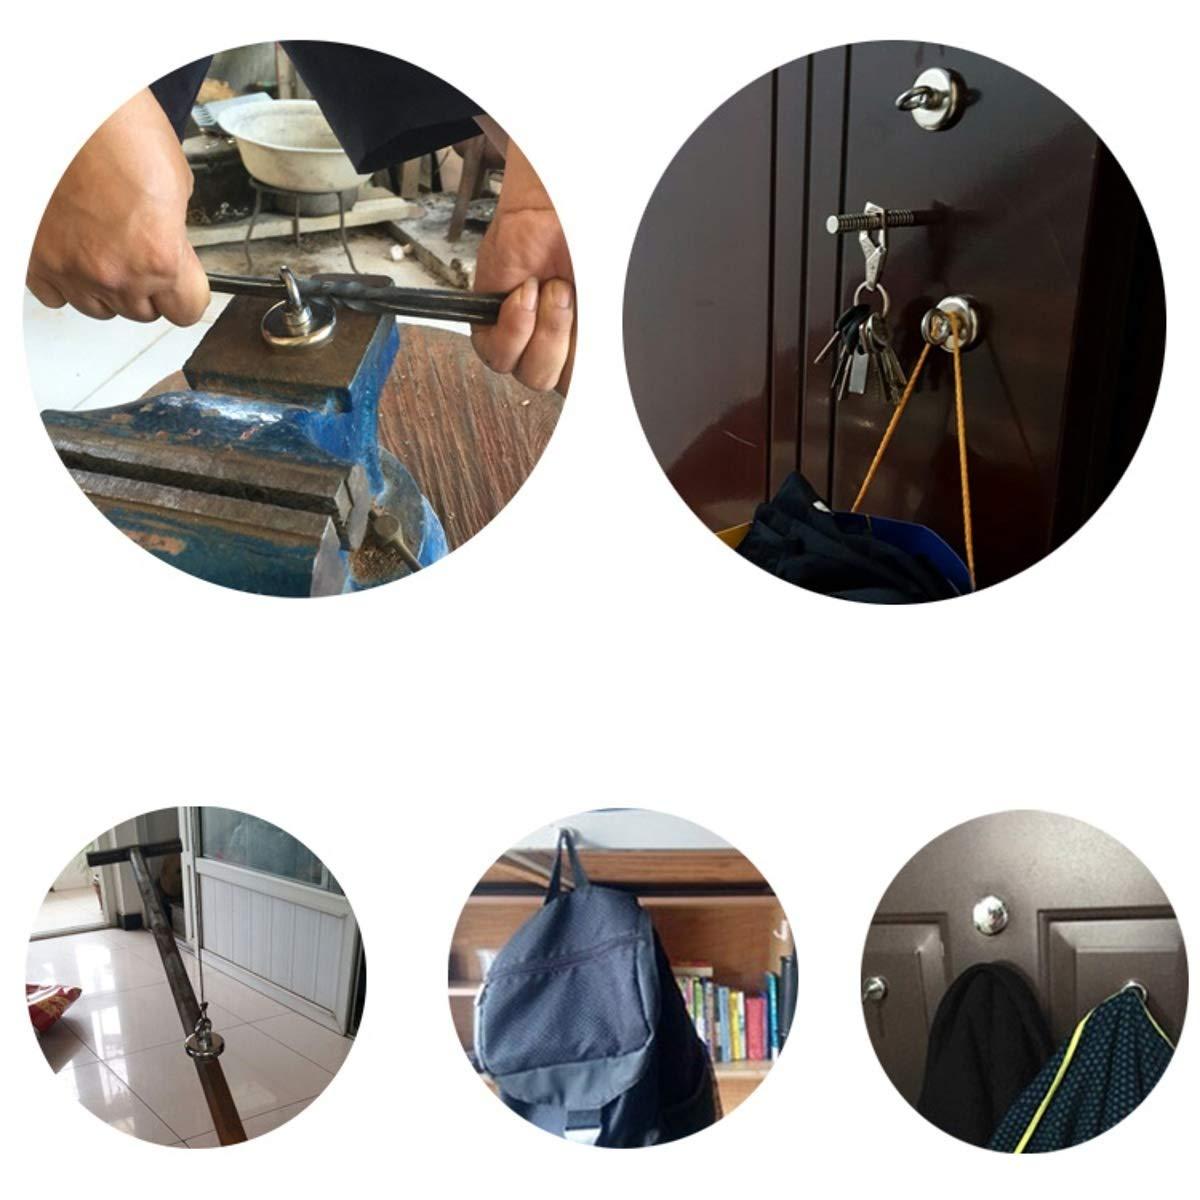 Amazon.com: LIShuai Strong N52 Neodymium Detector Eyebolt Ring Magnet D42x40mm Salvage Hunting: Home & Kitchen